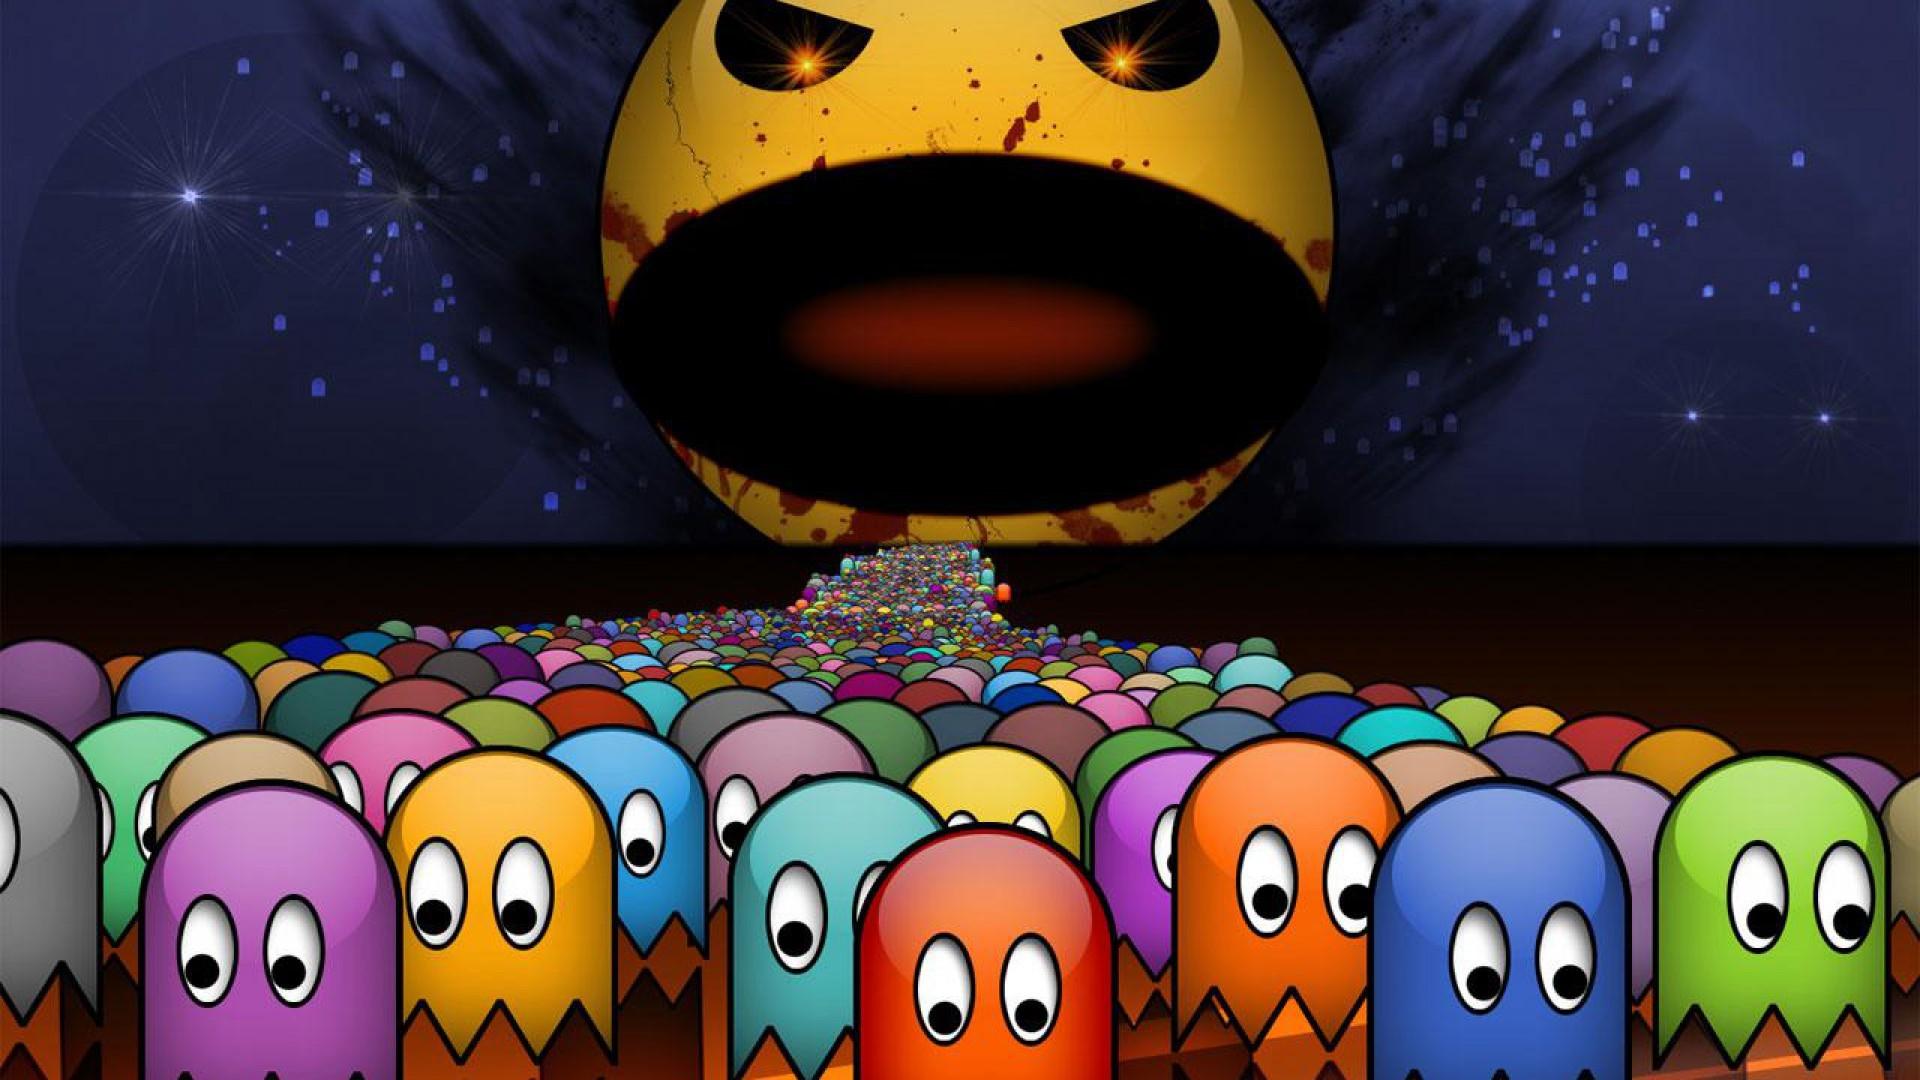 Explore Man Wallpaper, Pac Man, and more!